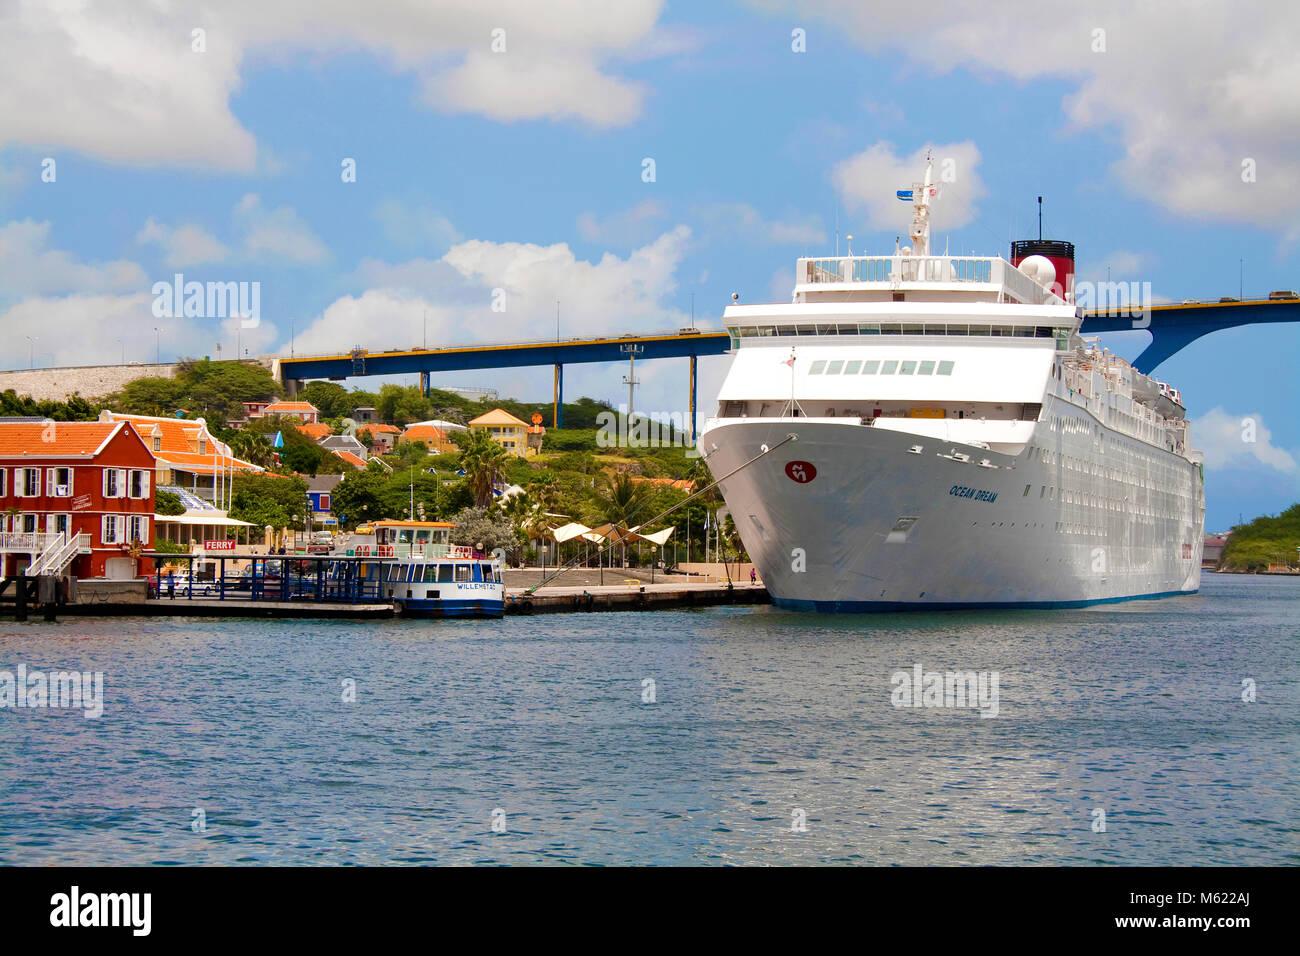 Cruise ship at Sint Anna Baai, Otrobanda district, Queen-Juliana bridge, Willemstad, Curacao, Netherlands Antilles, - Stock Image